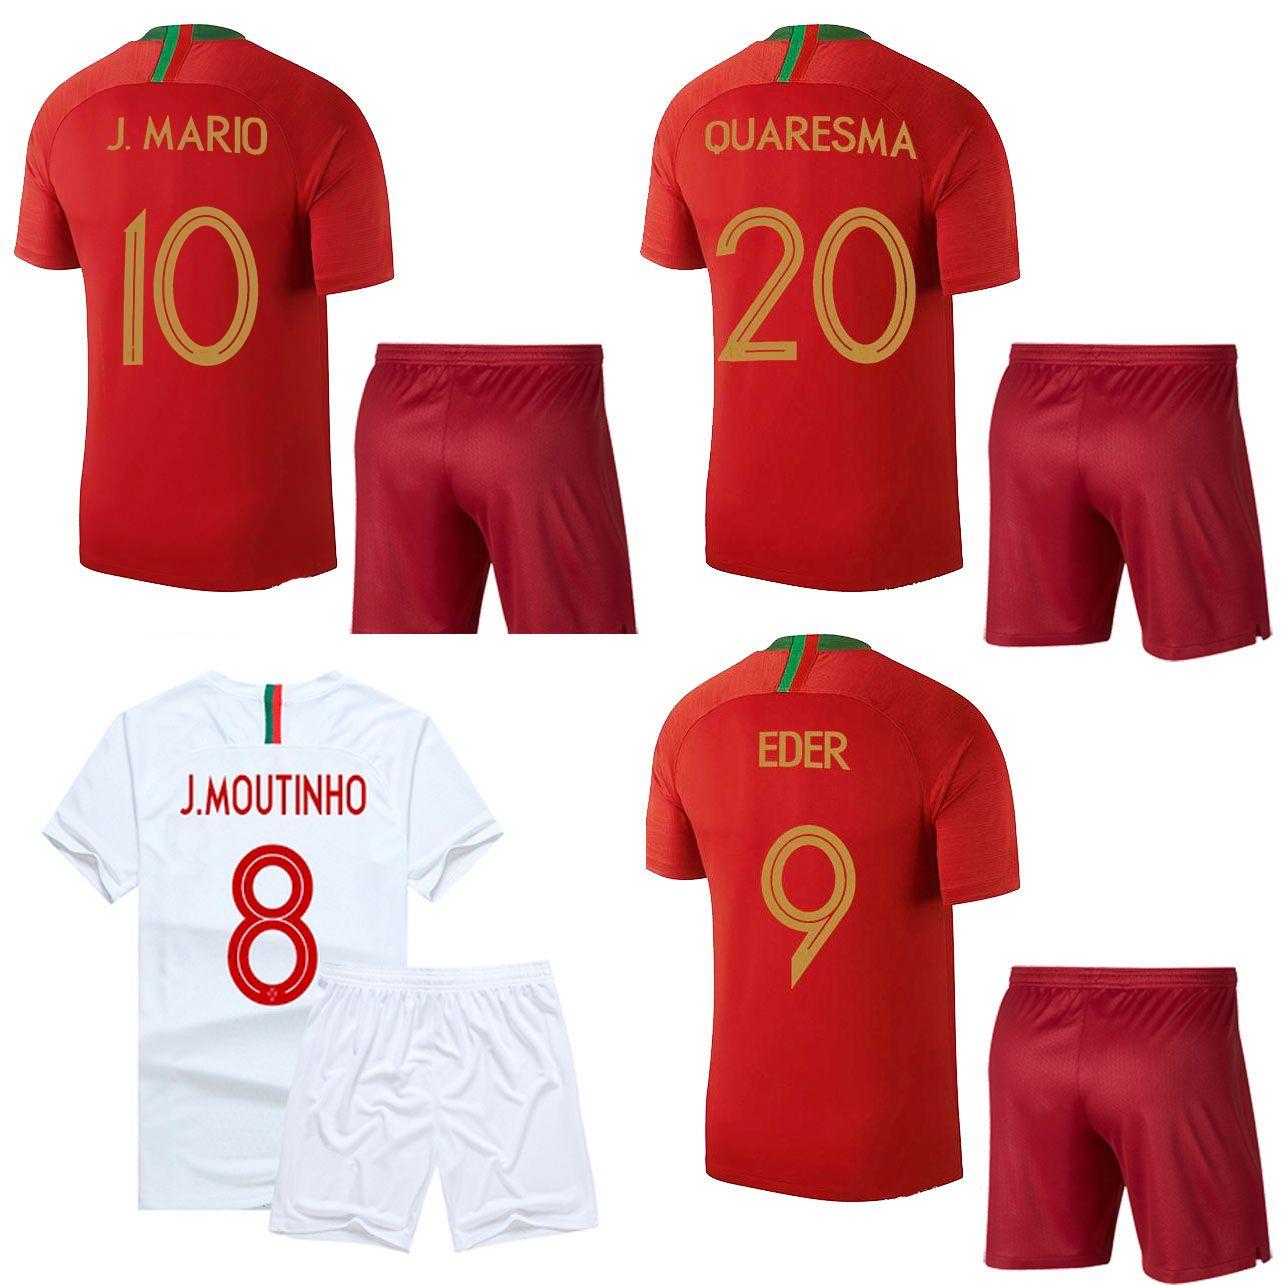 42451a1c8 2018 2019 MOUTINHO Soccer jersey Shorts World Cup 2018 National Team  Football Kits QUARESMA ANDRE SILVA short sleeve adult s sports uniform